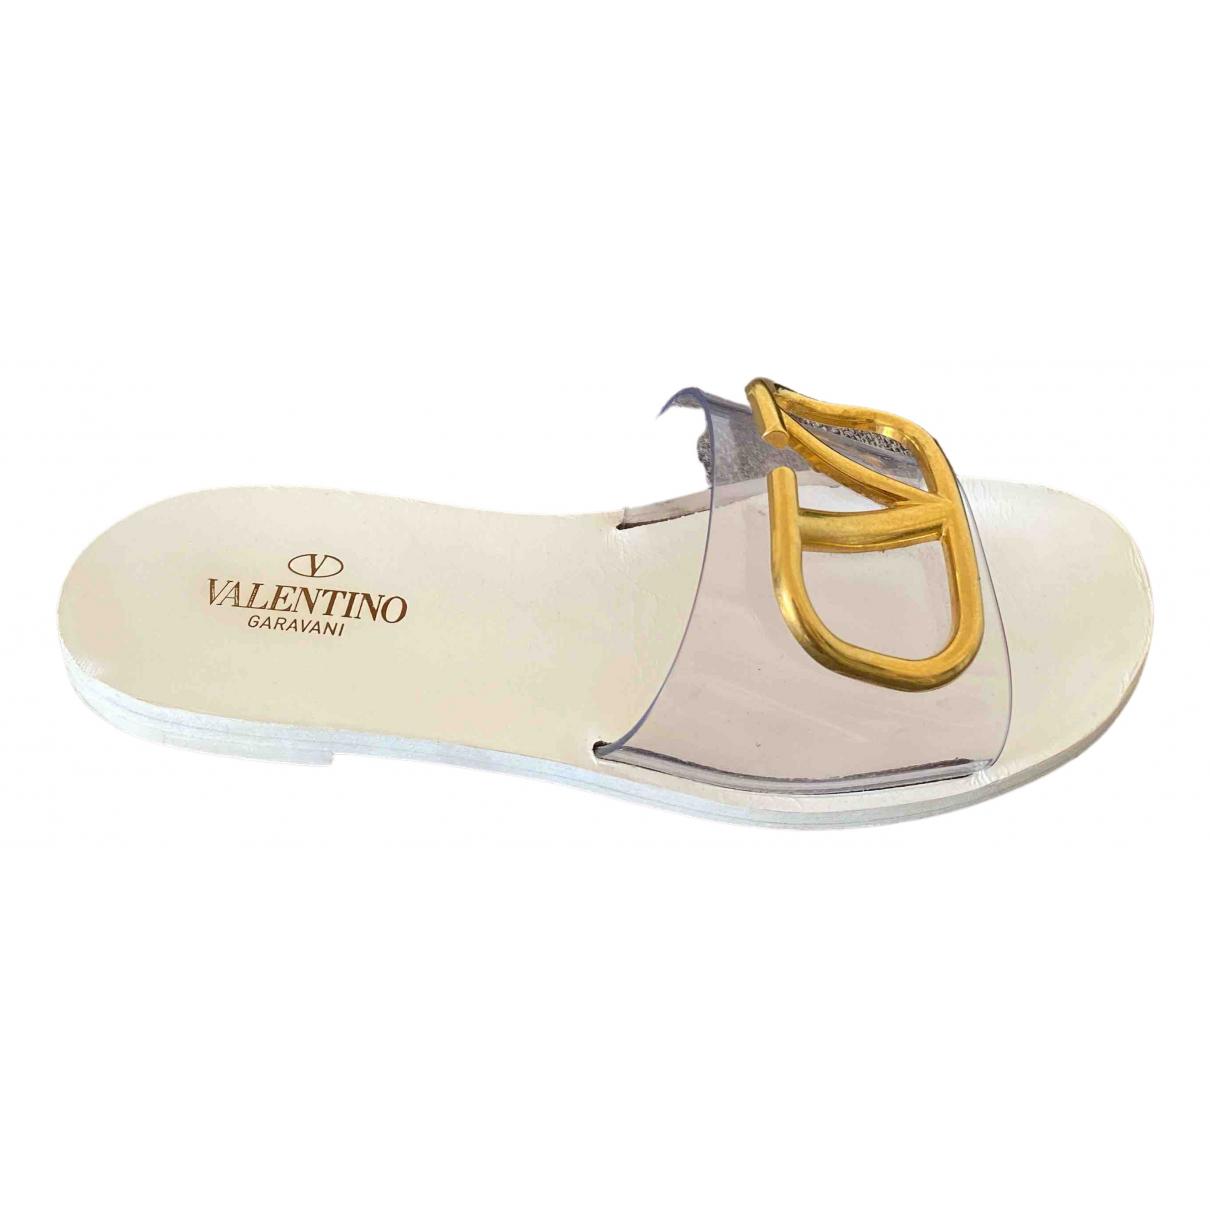 Valentino Garavani - Sandales VLogo pour femme - blanc